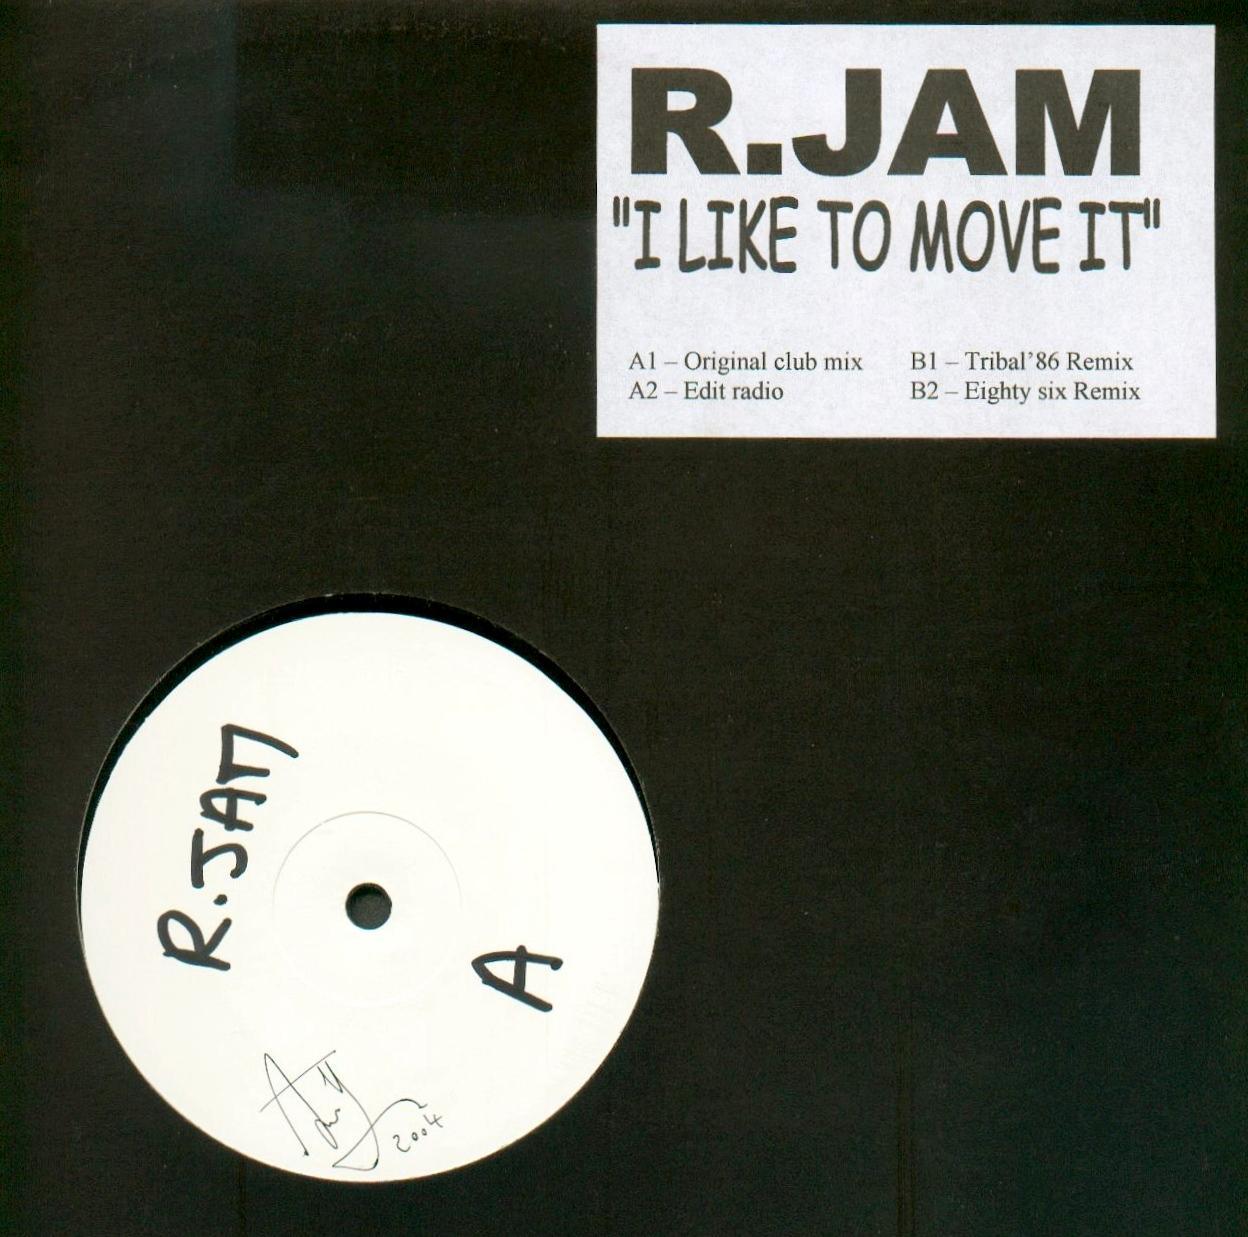 R.JAM I like to move it